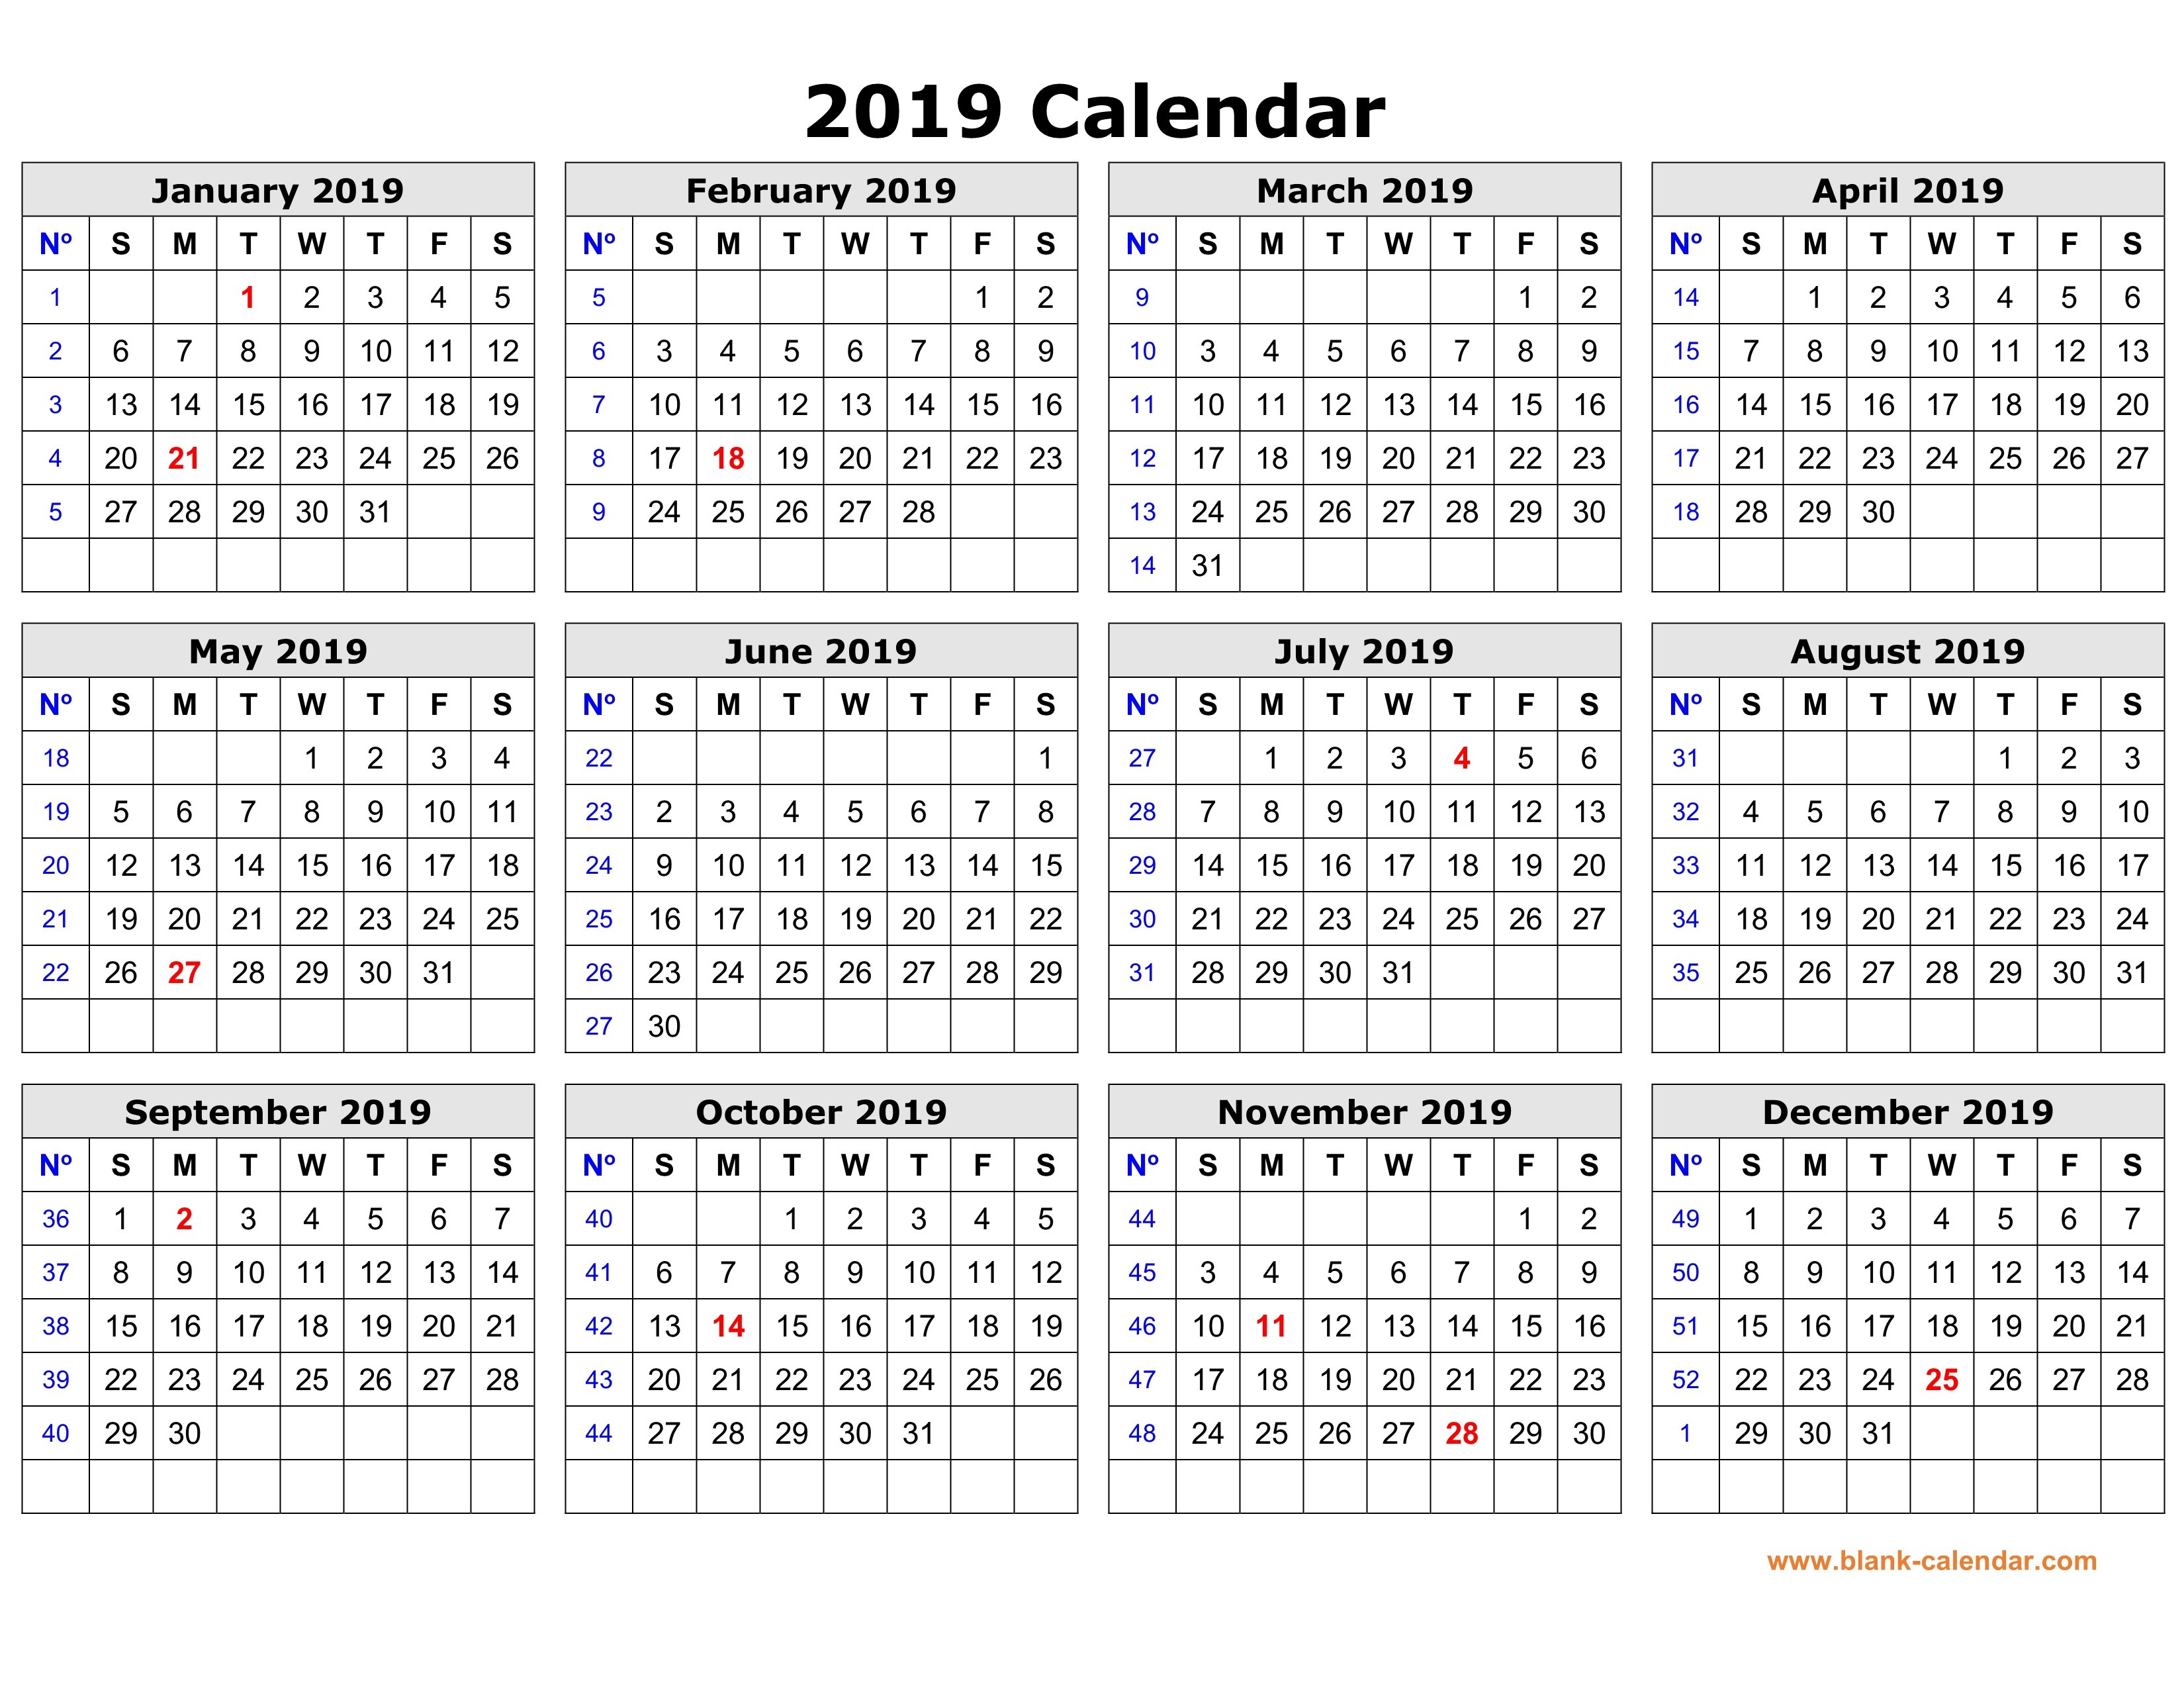 Free Download Printable Calendar 2019 In One Page, Clean Design. Calendar 2019 Year Printable